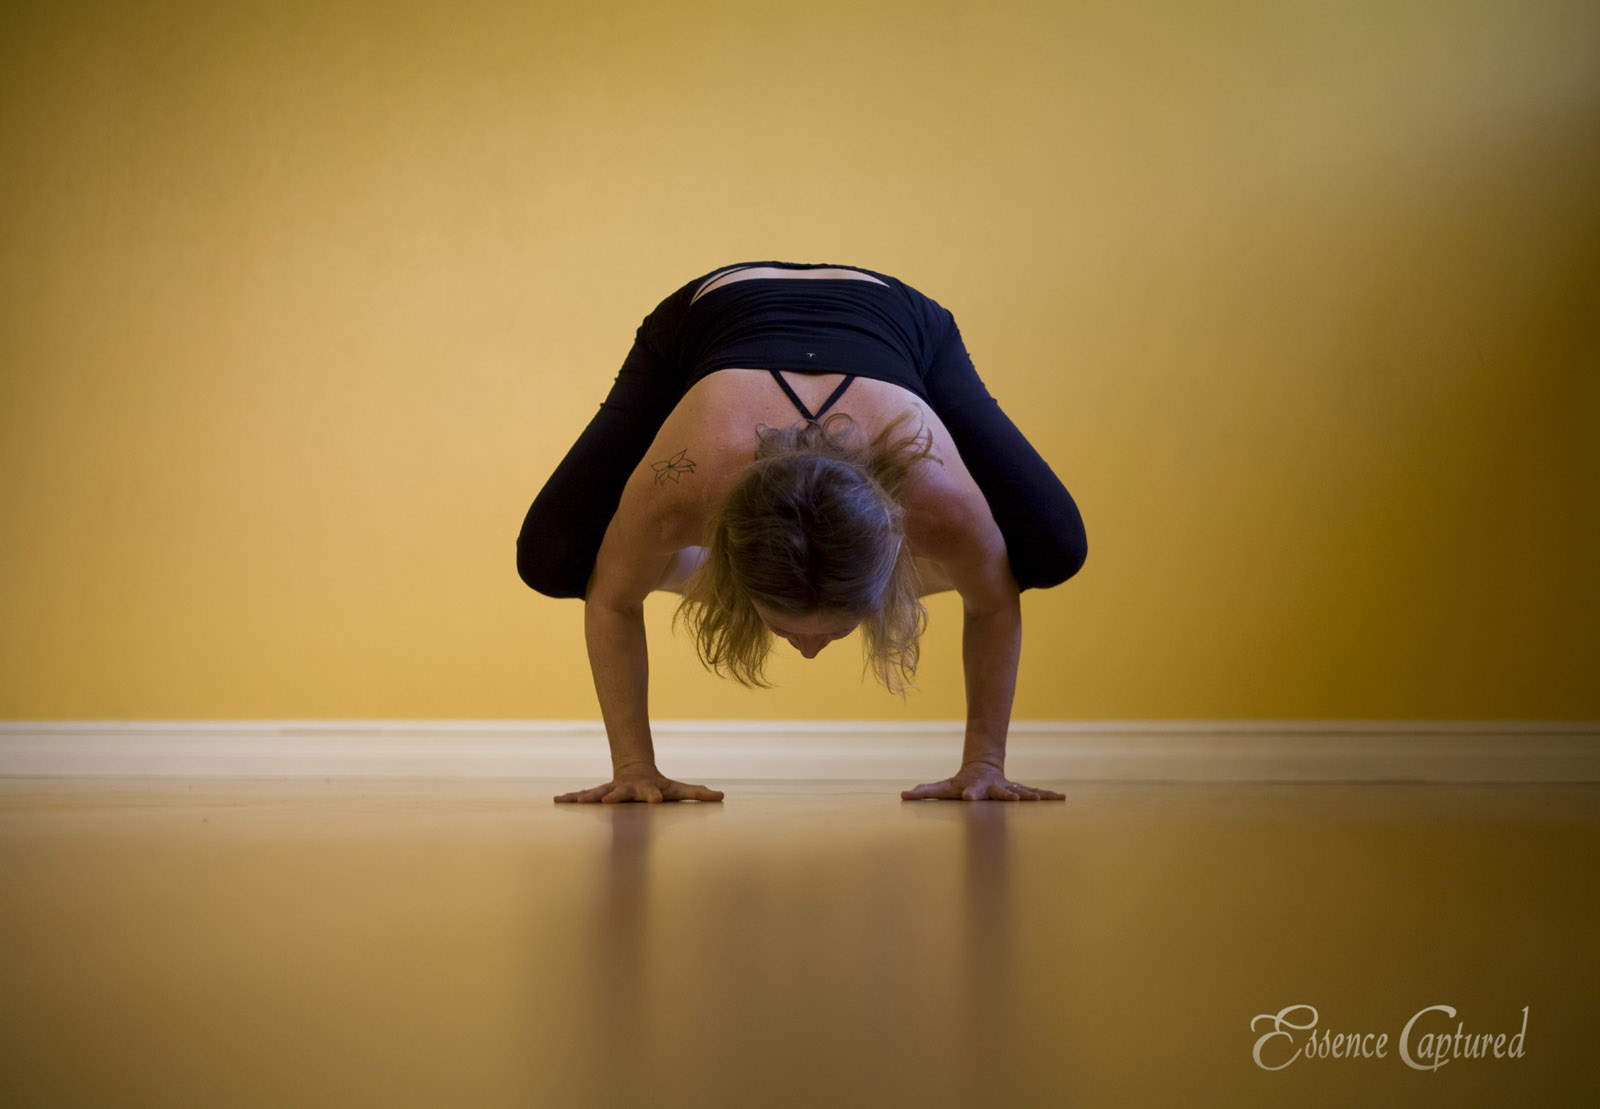 female yoga pose on hands yellow studio wall backdrop